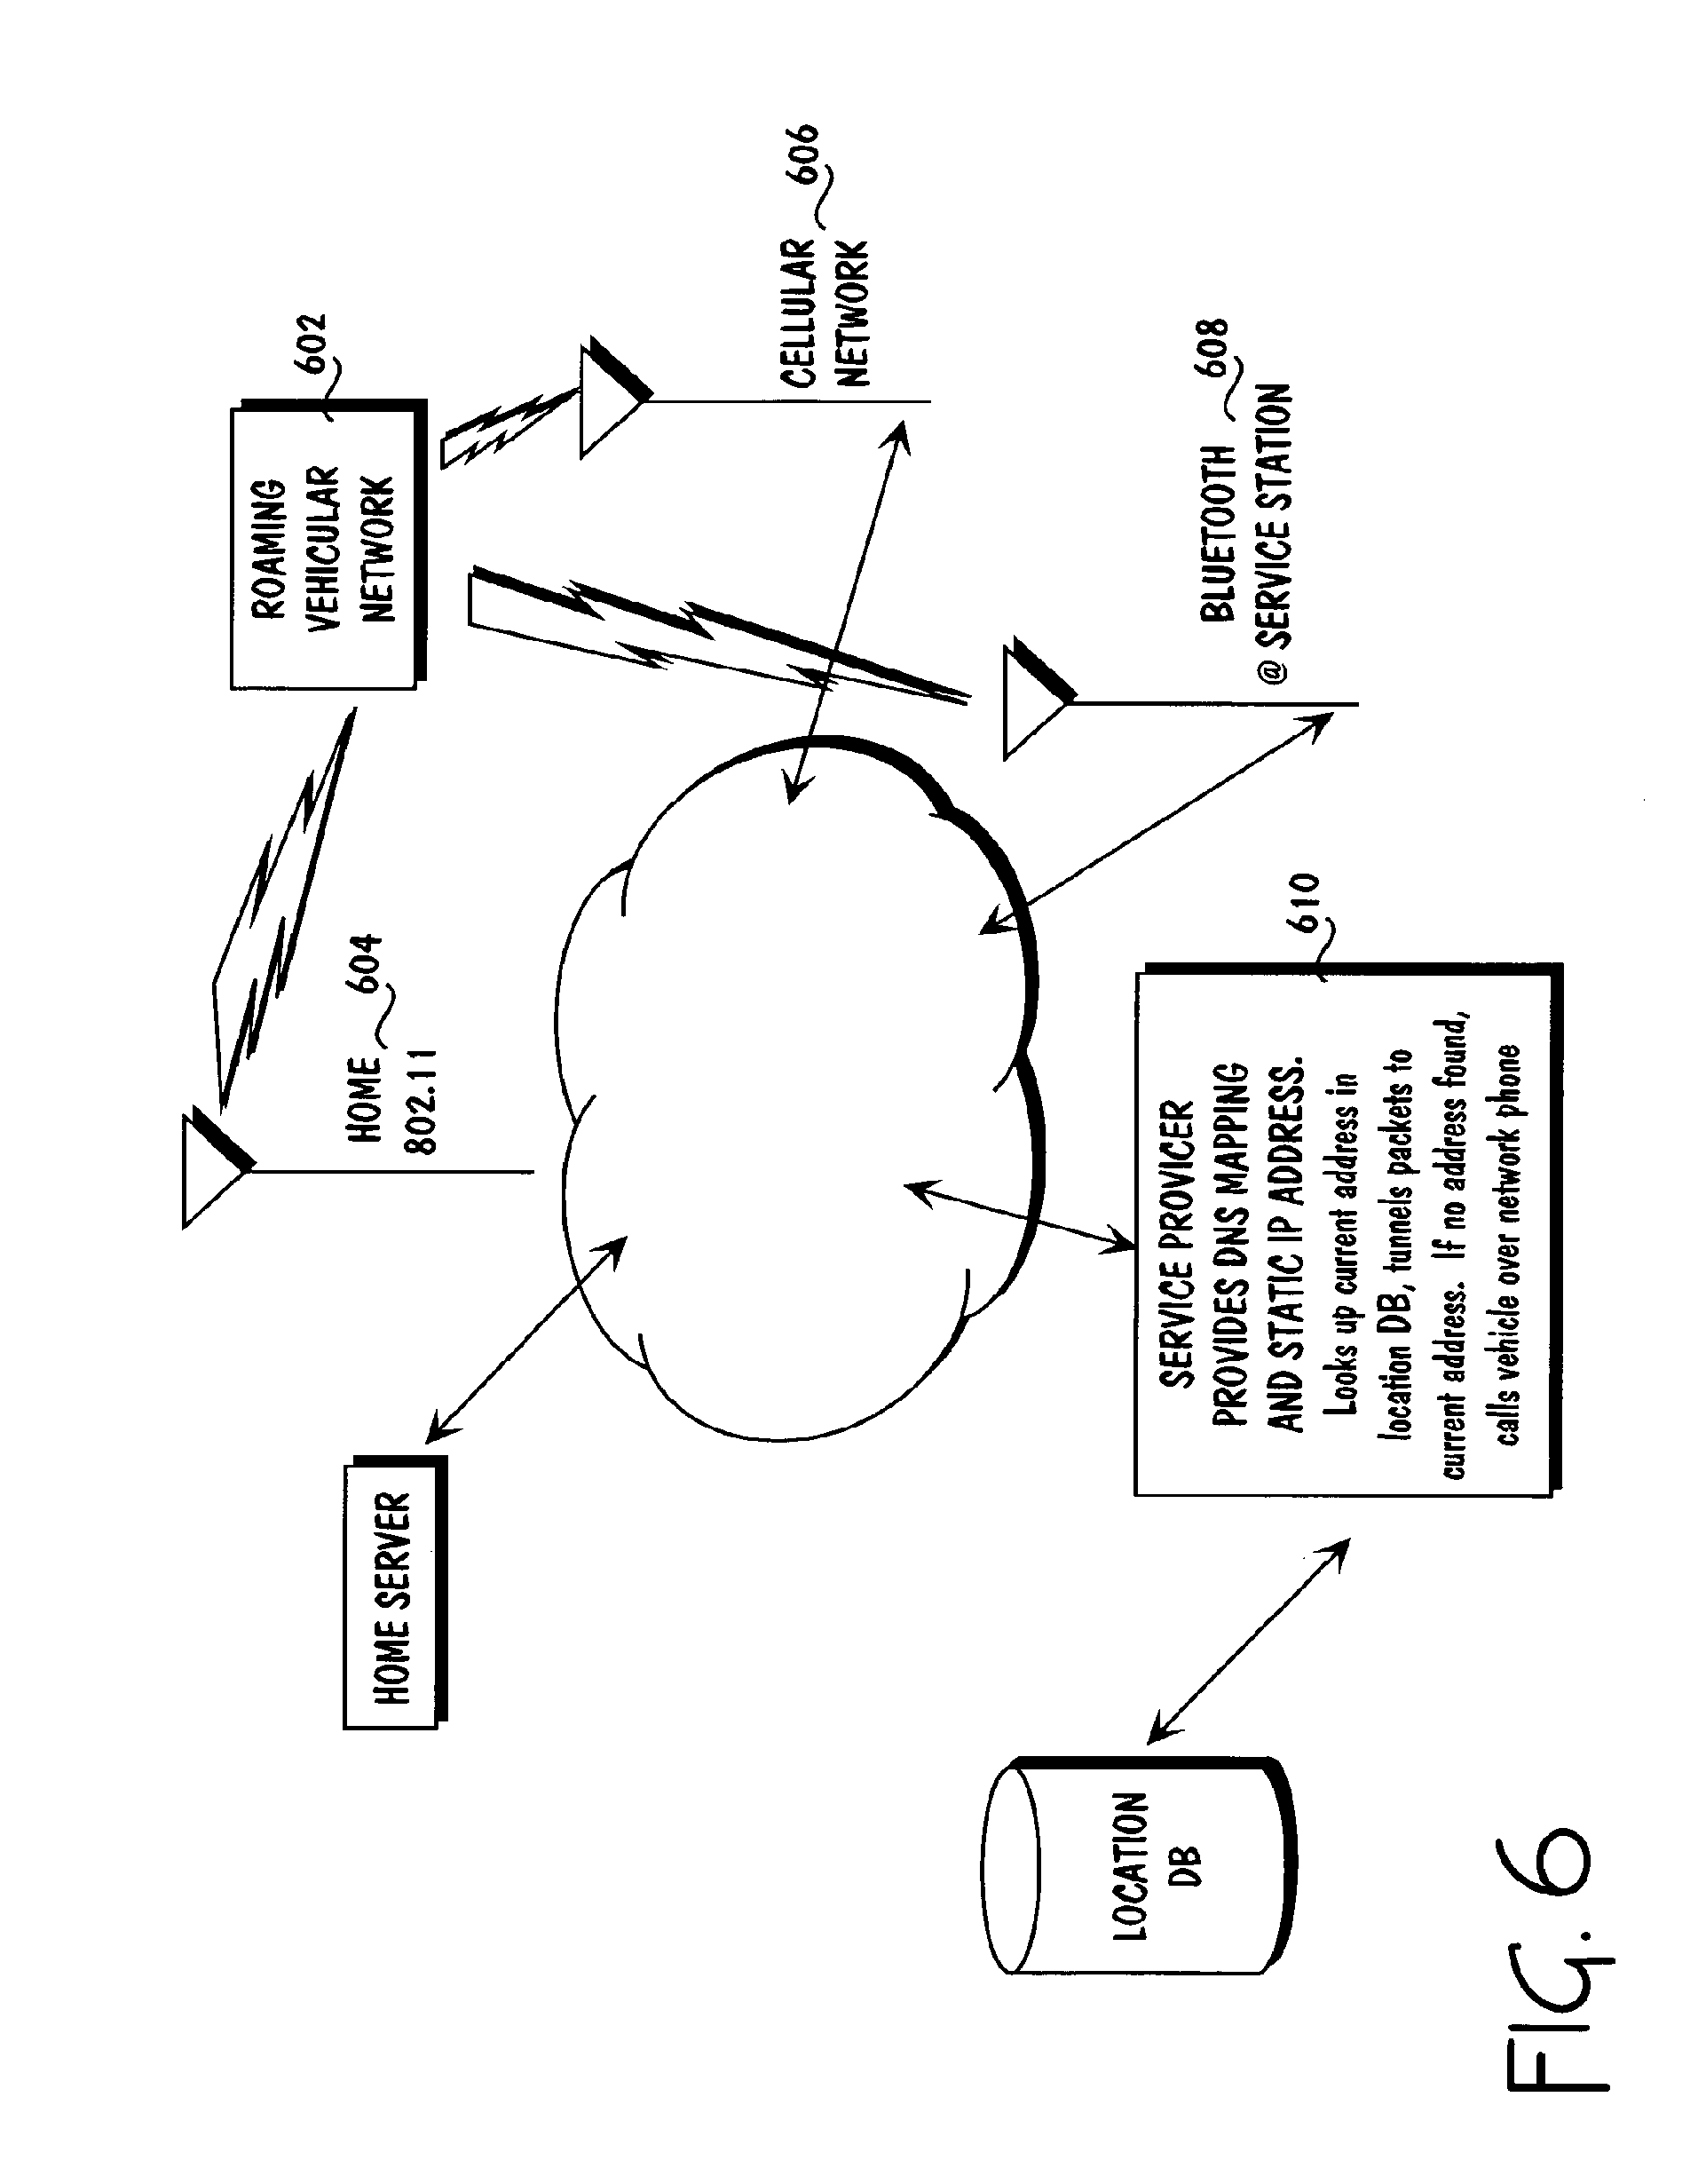 Patent US 8,601,595 B2